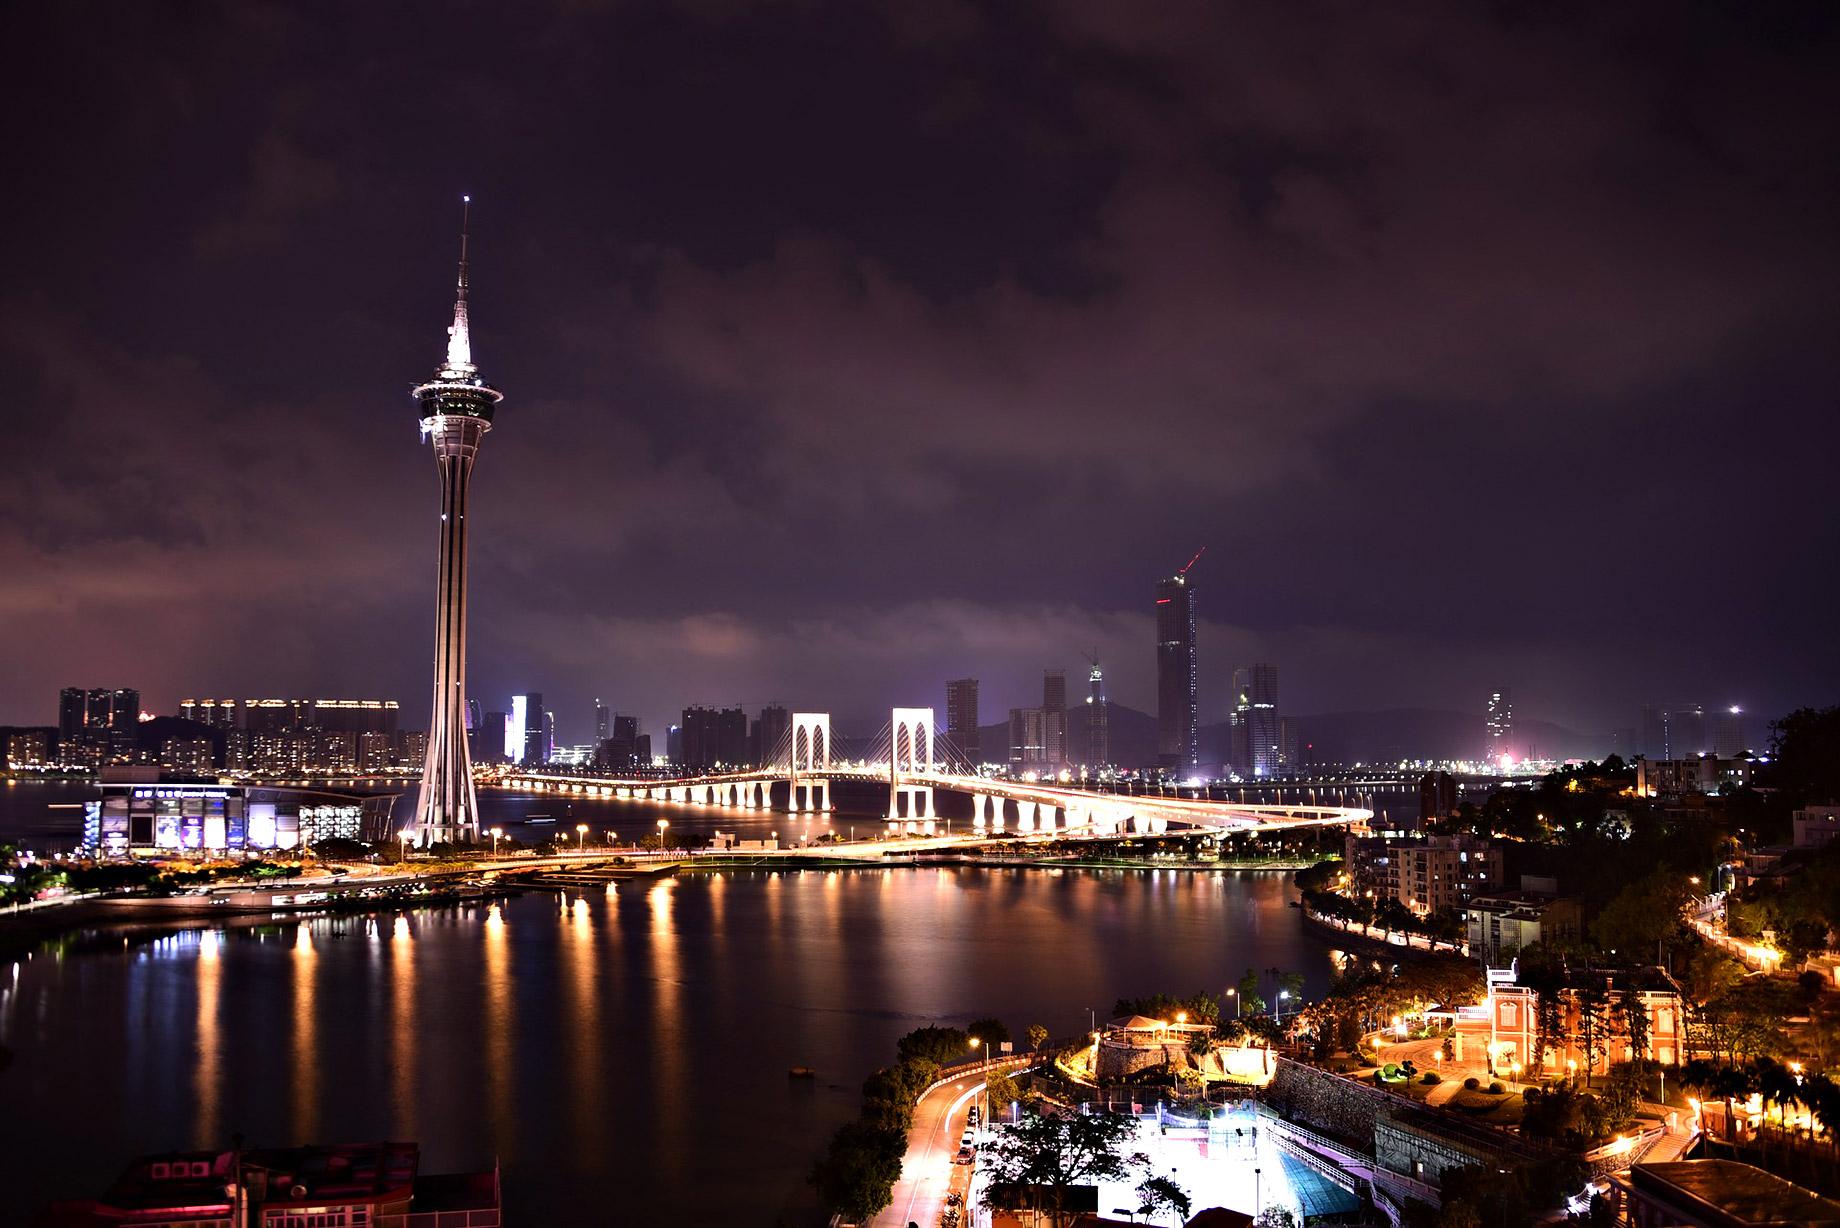 Macau, China at Night